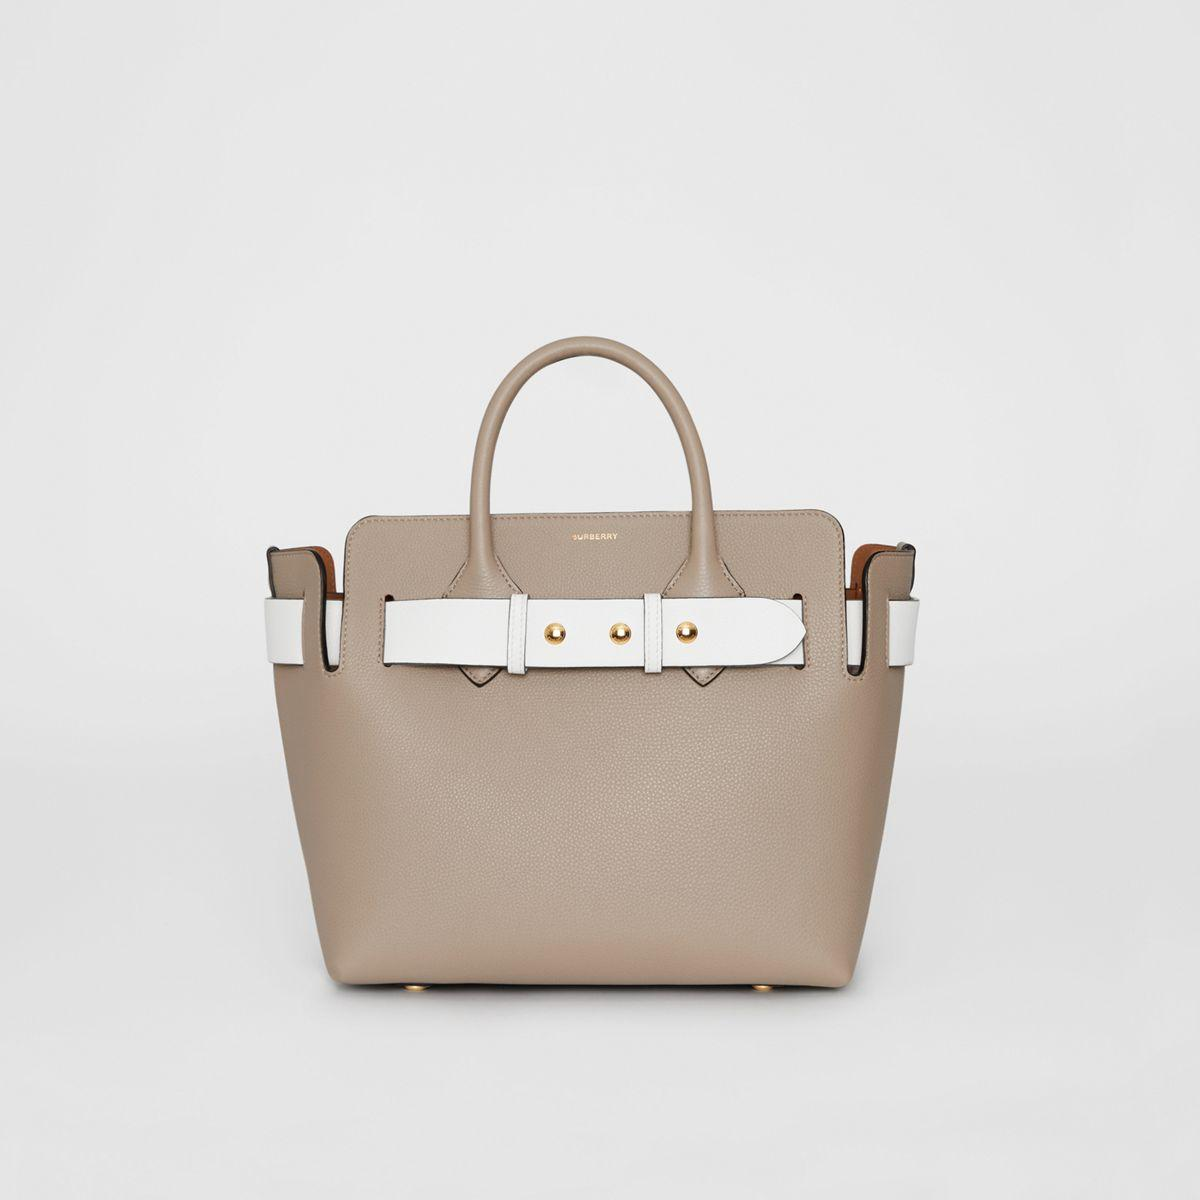 b0aae8ea27d1 Burberry - Gray The Medium Tri-tone Leather Triple Stud Belt Bag - Lyst.  View fullscreen